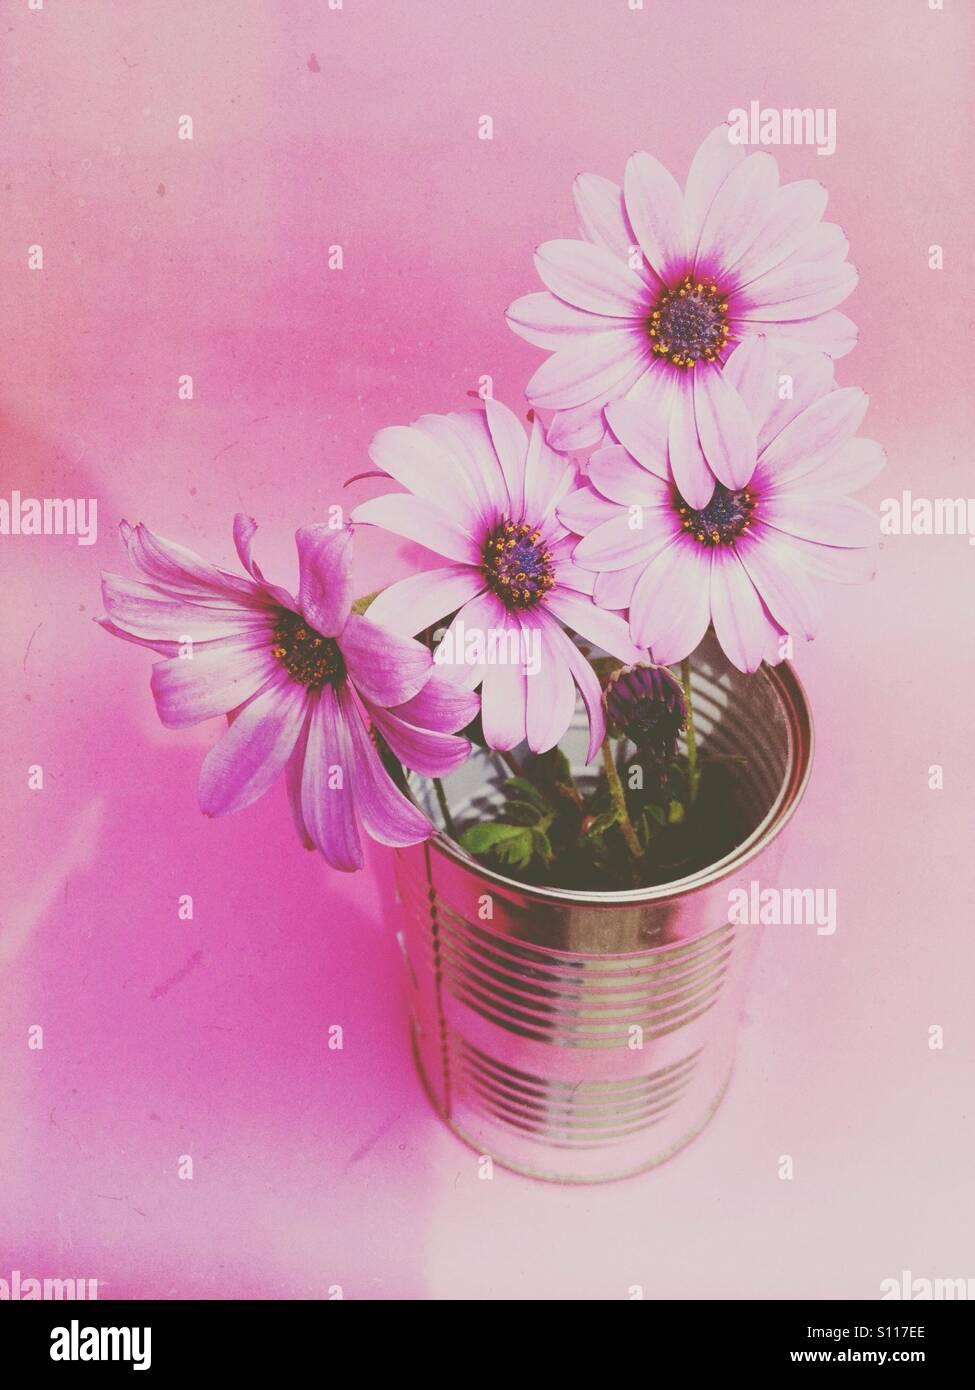 Daisy flores con un filtro aplicado. Foto de stock